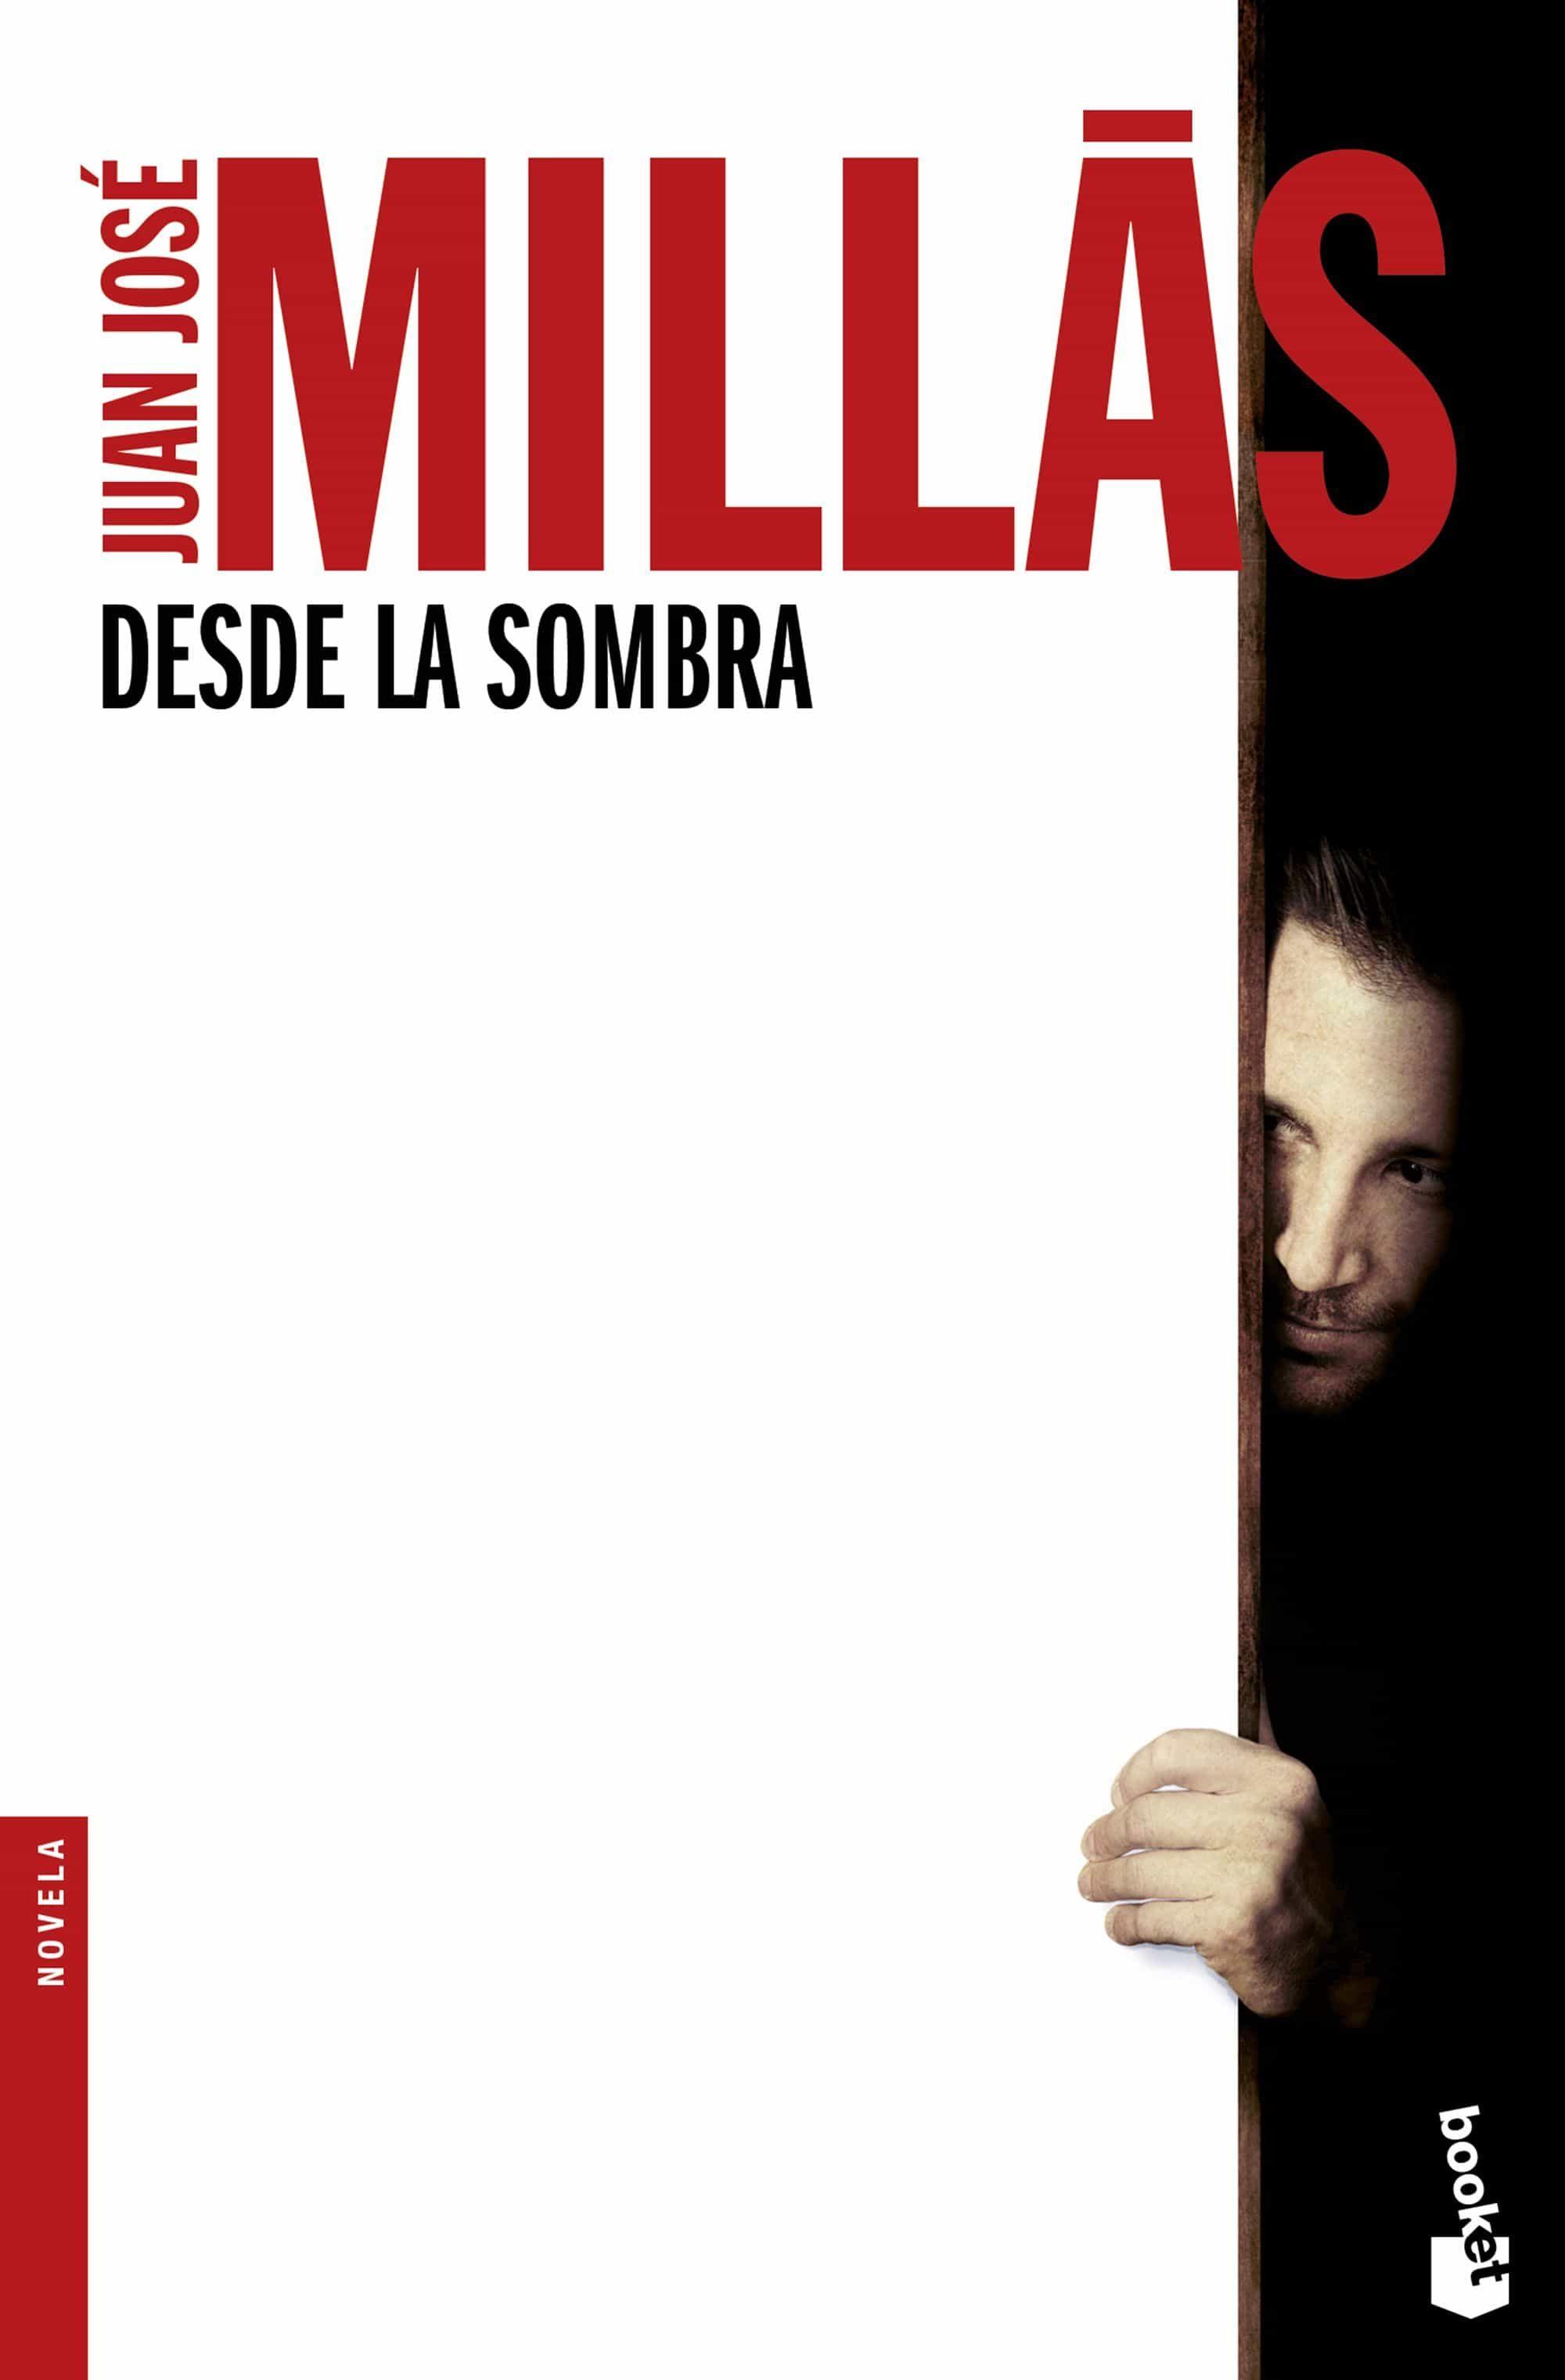 Desde La Sombra por Juan Jose Millas